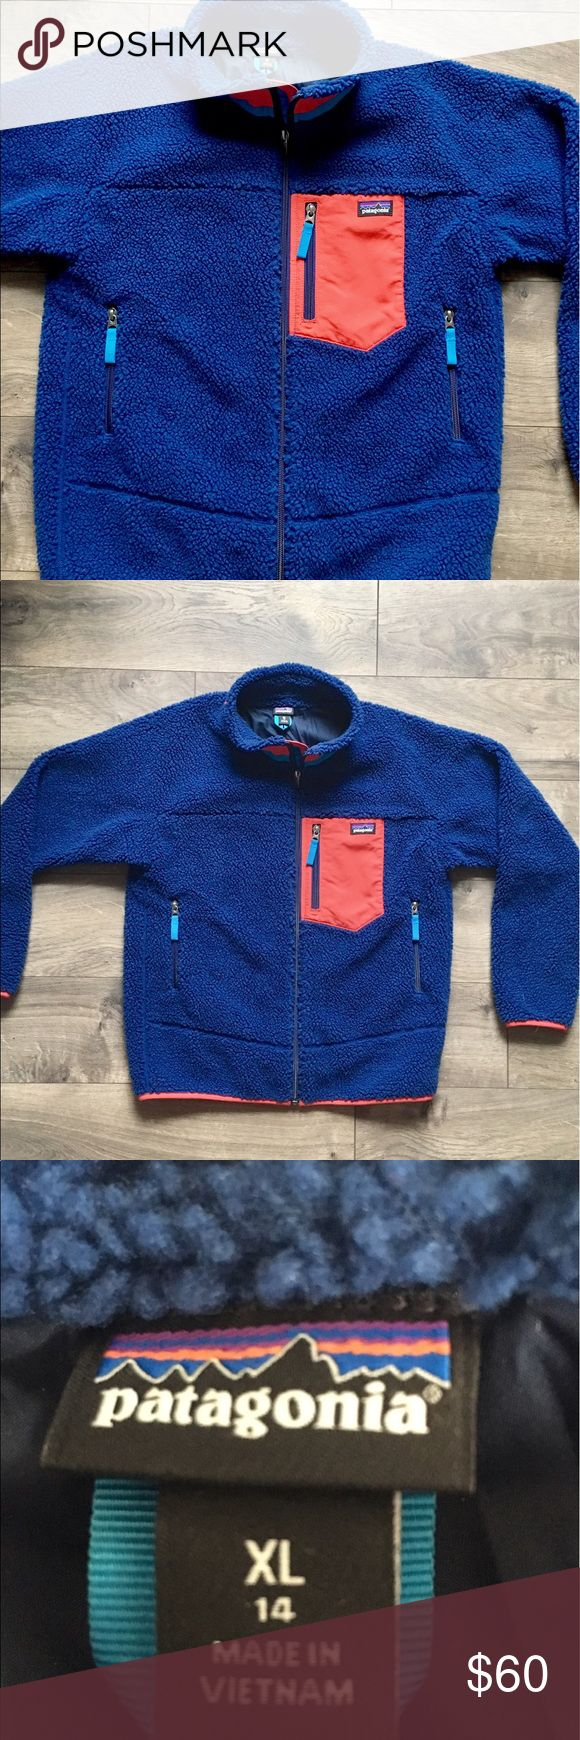 Kids Patagonia Retro X jacket size 14 Kids Patagonia Retro X jacket size 14. Great condition. Worn once. Patagonia Jackets & Coats